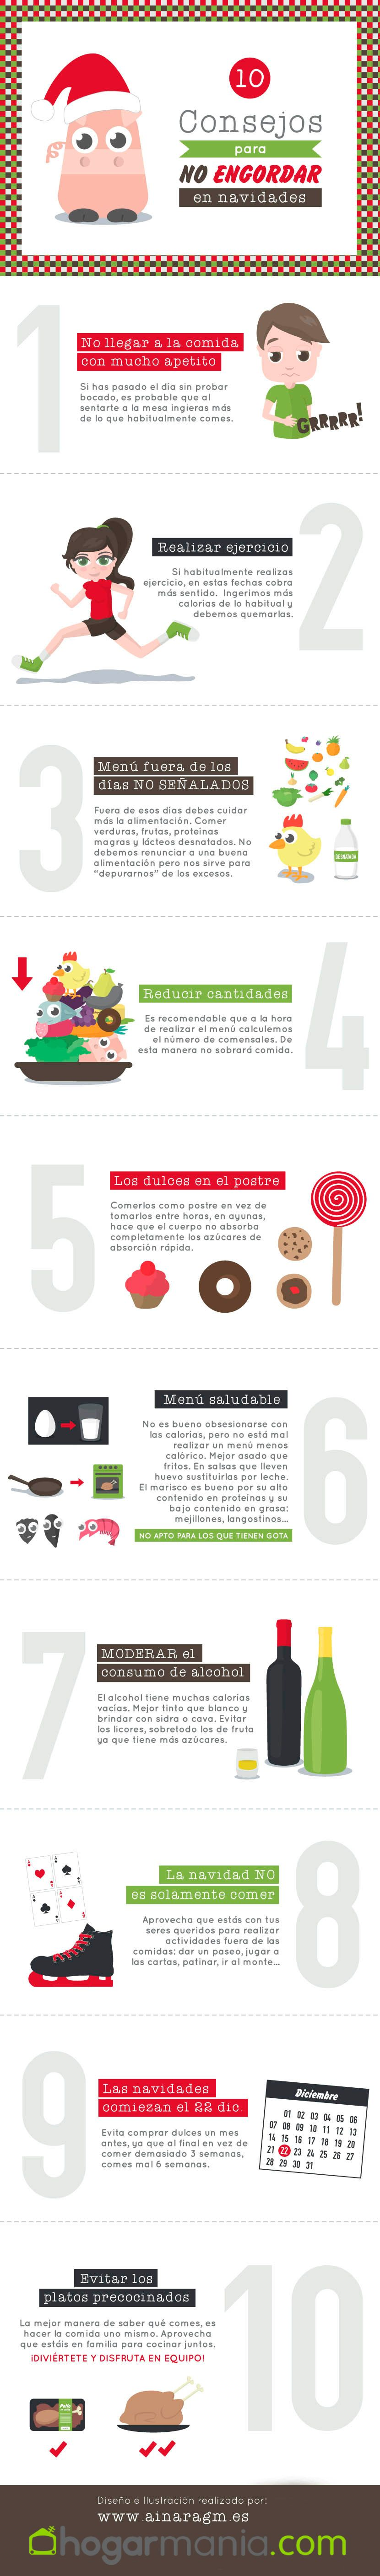 infografia consejos engordar navidad